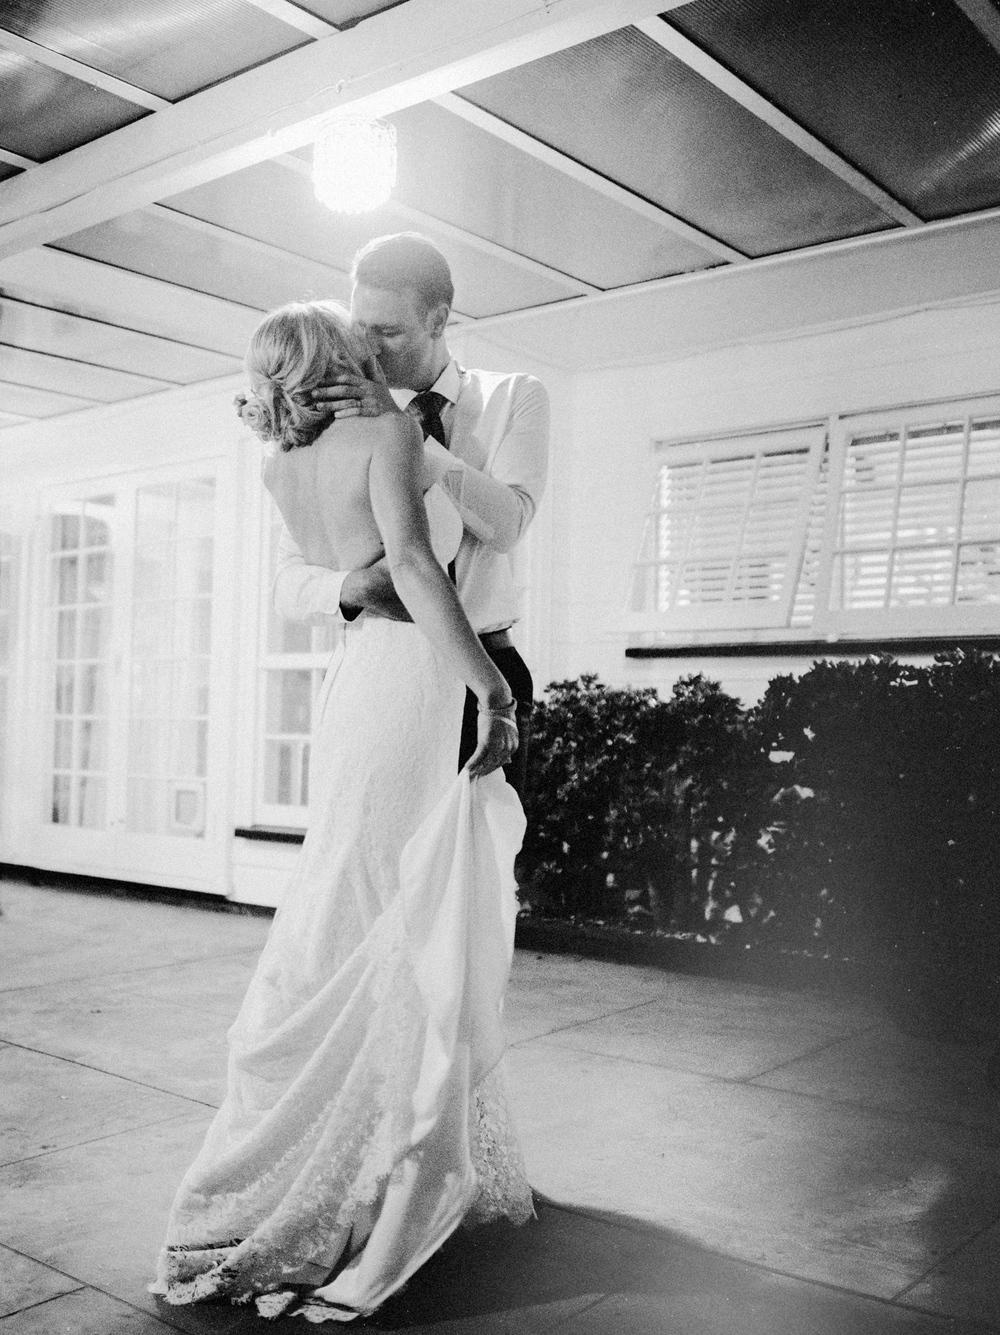 new-zealand-wedding-film-photographer-ryan-flynn-0062.JPG